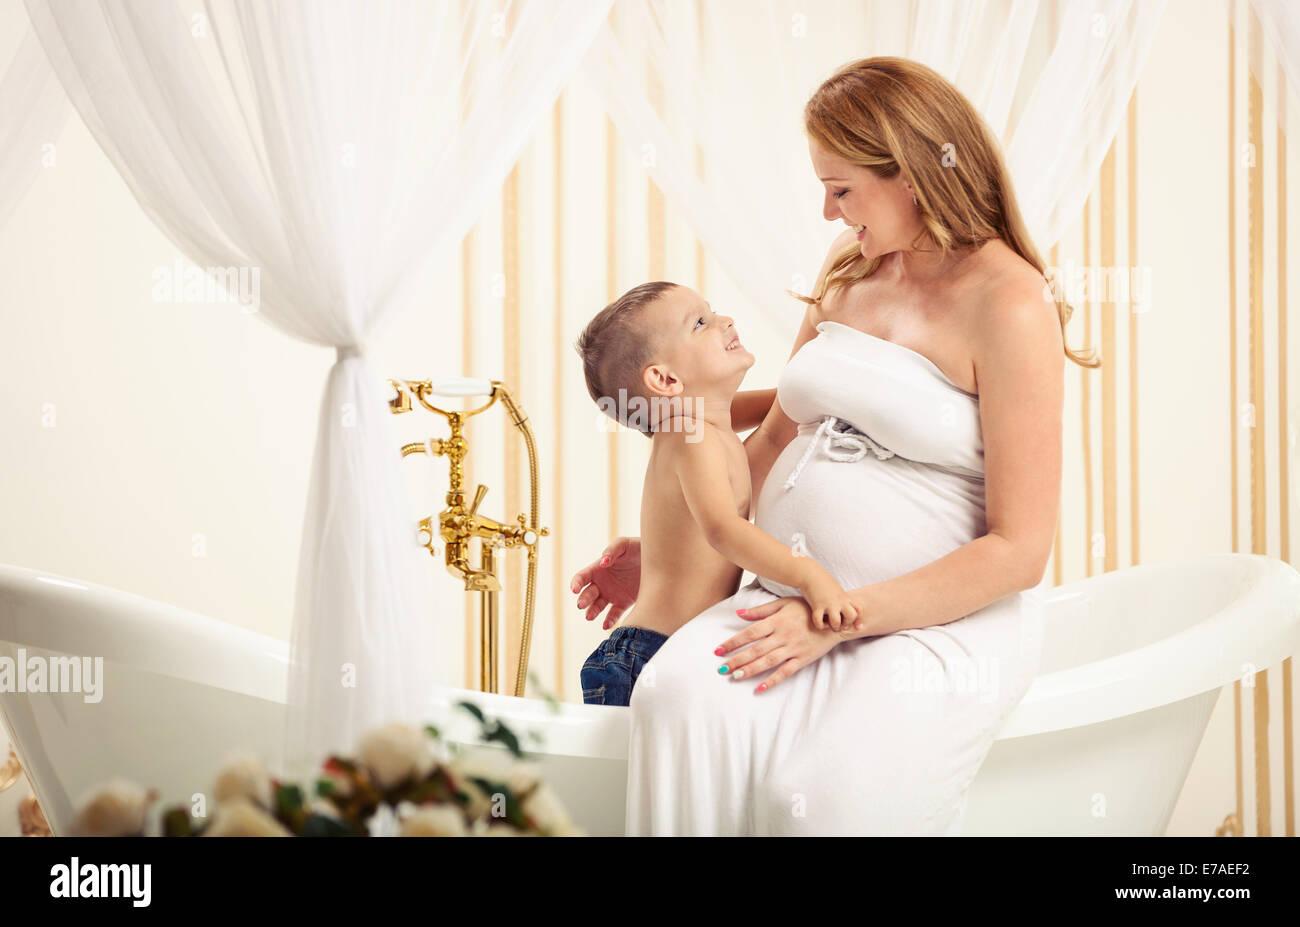 Boy mom pics and Funny Mom